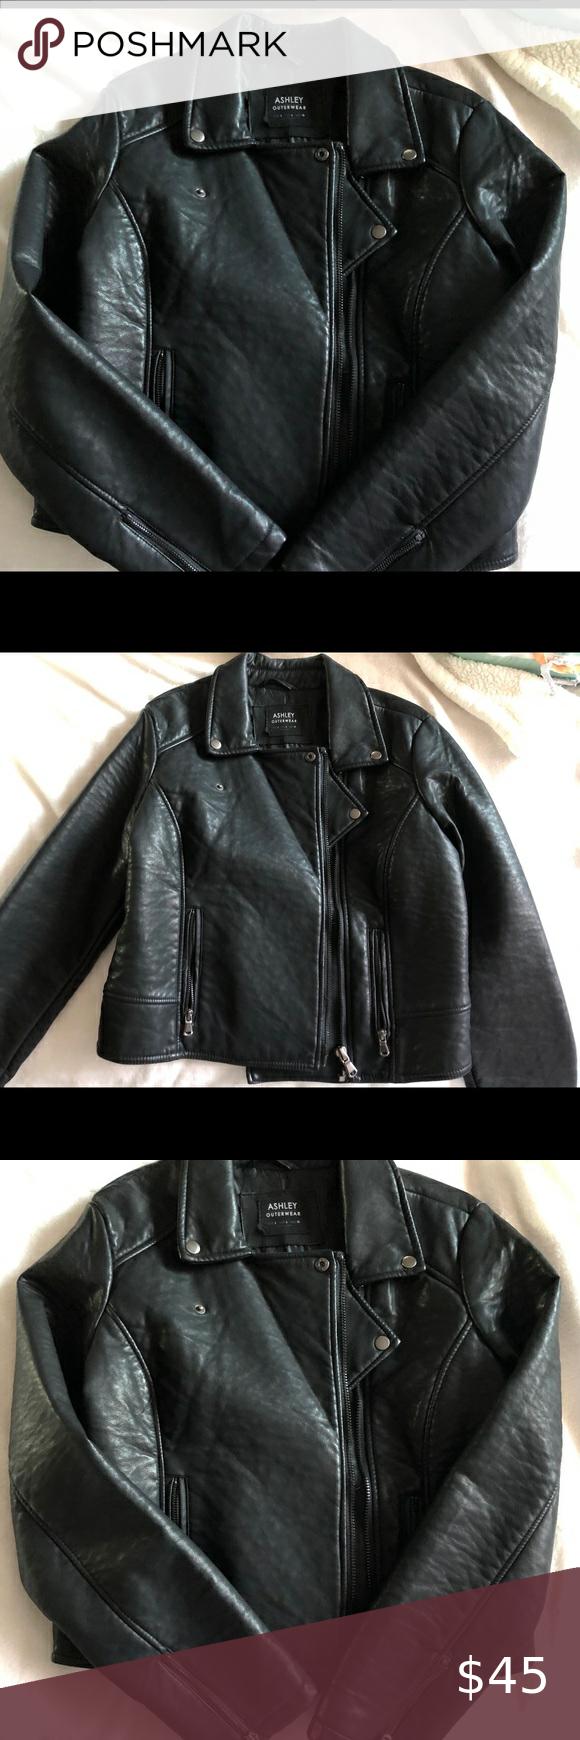 Black Faux Leather Jacket Warm And Stylist Black Faux Leather Jacket Received It As A Gift And O Black Faux Leather Jacket Faux Leather Jackets Leather Jacket [ 1740 x 580 Pixel ]